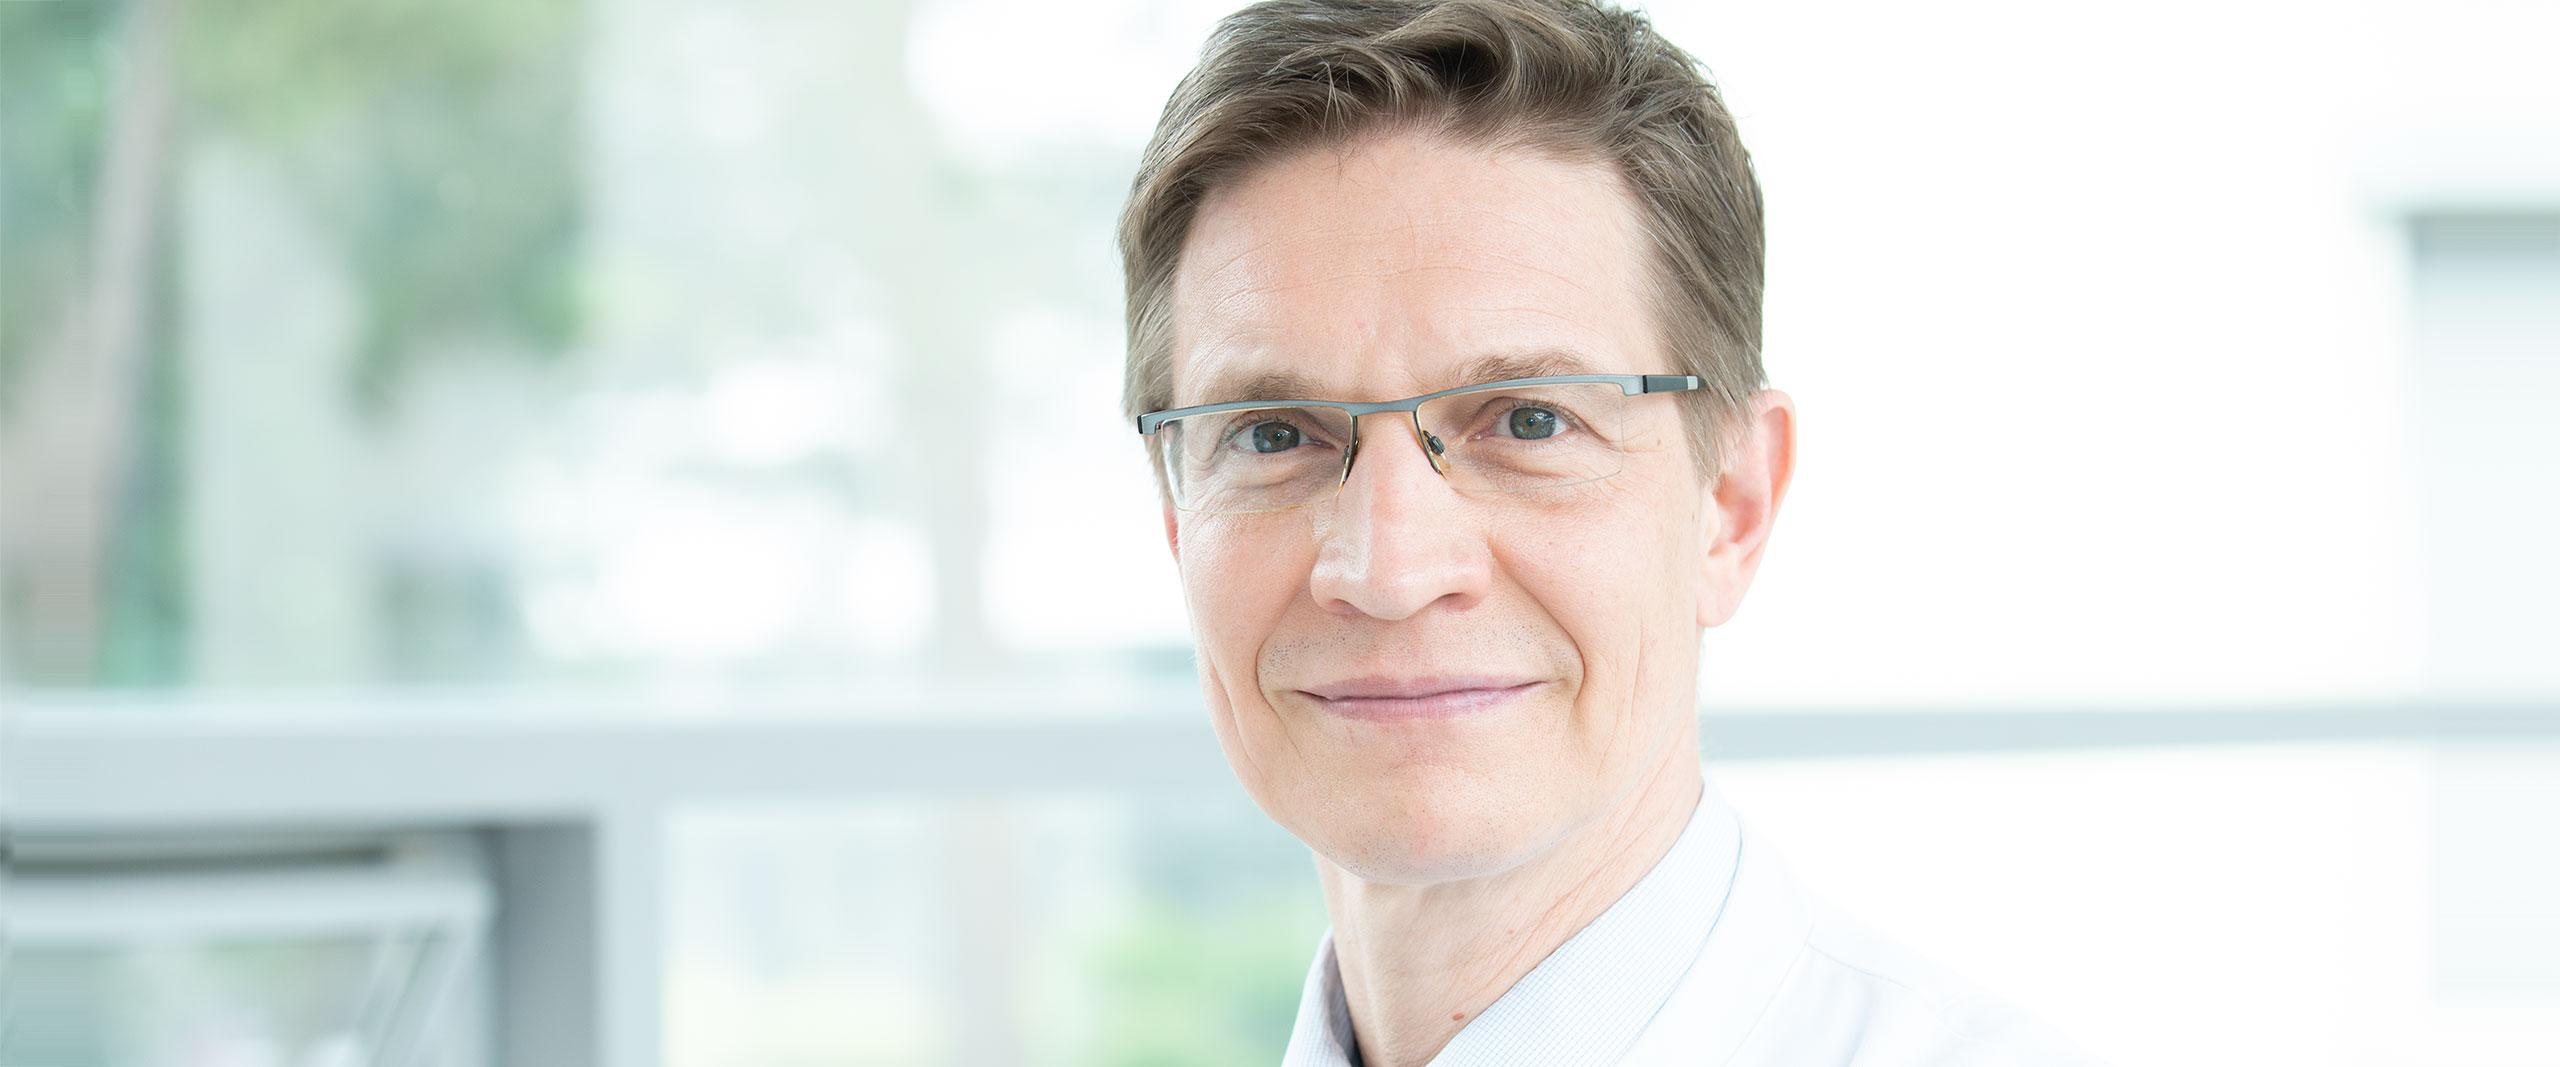 UKB-Leberexperte berät erneut Ständige Kommission Organtransplantation